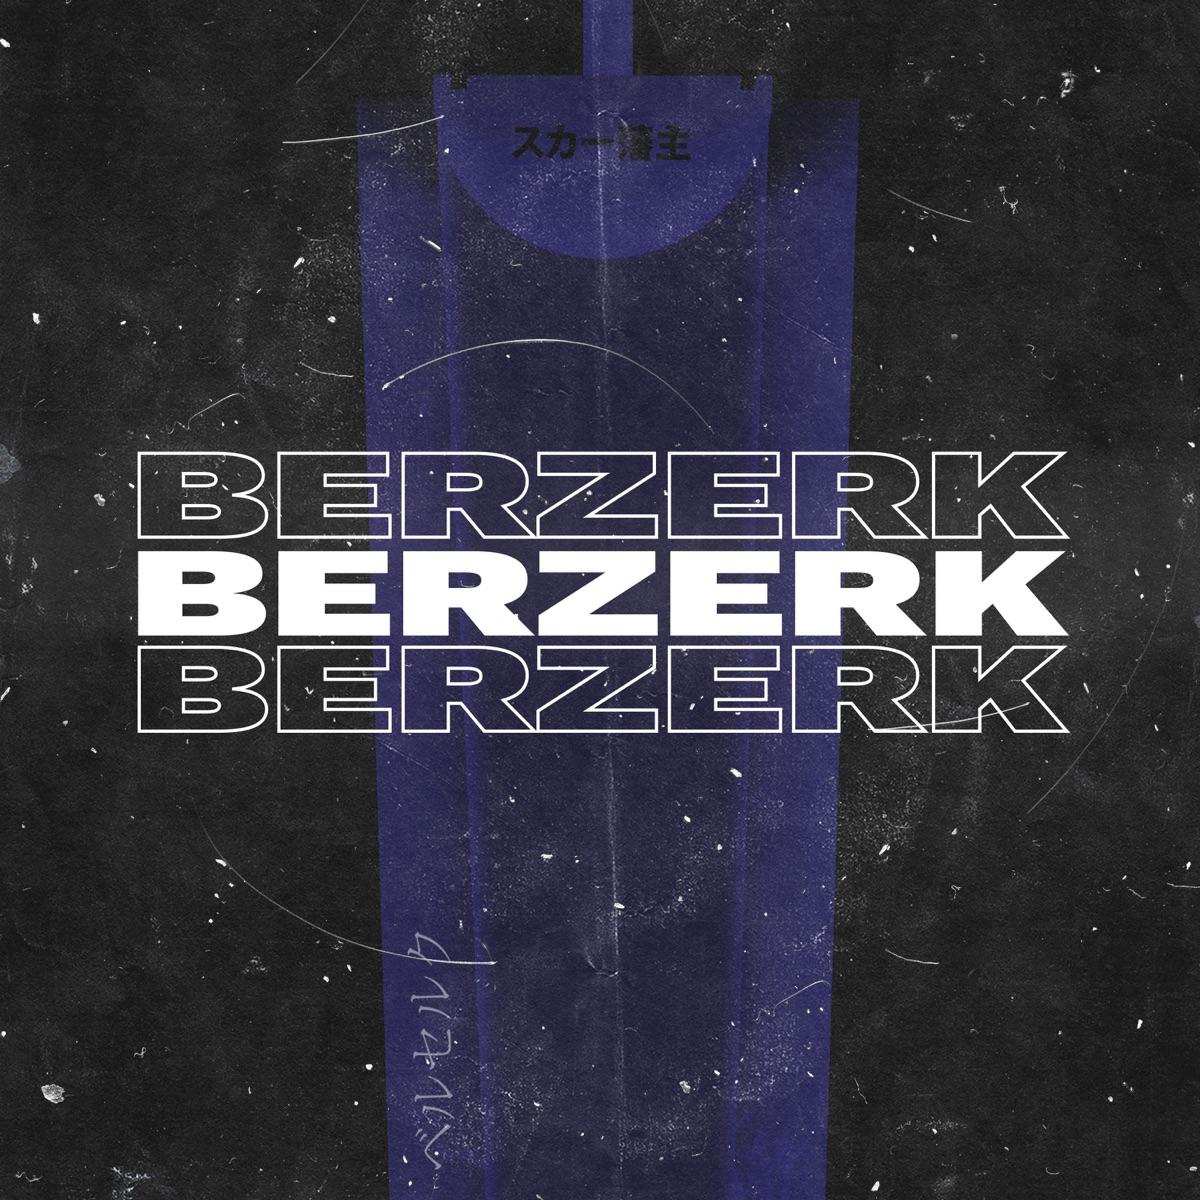 BERZERK - Single Album Cover by Scarlxrd